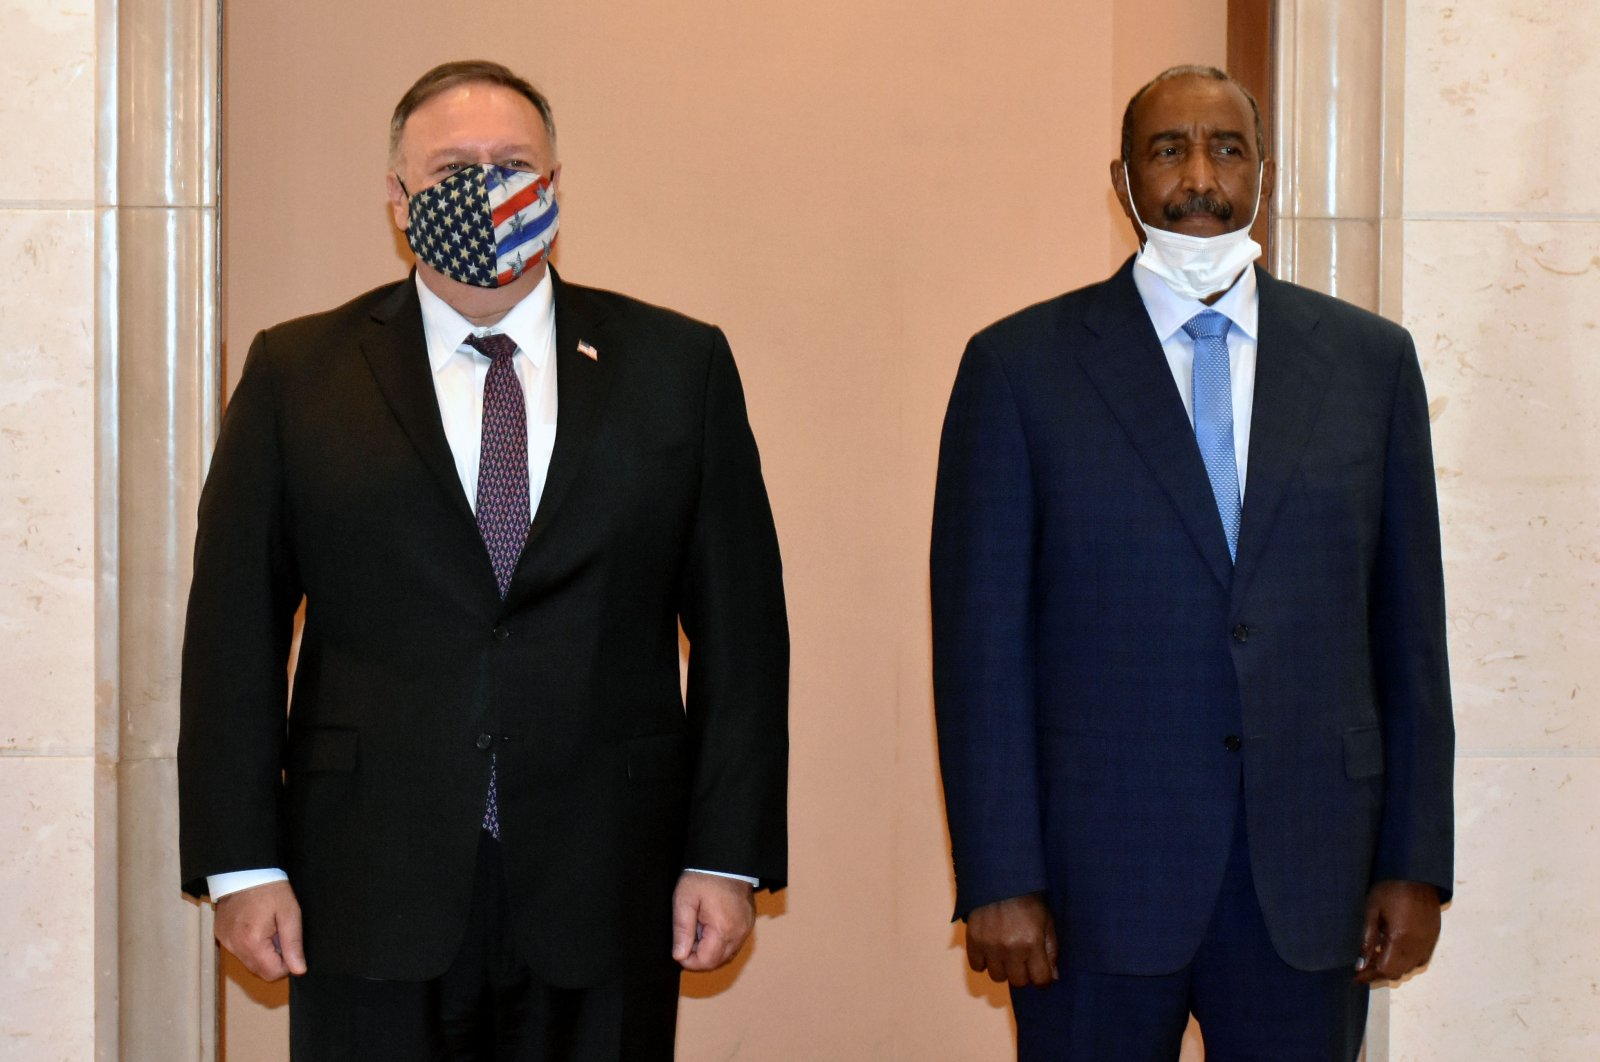 U.S. Secretary of State Mike Pompeo (L) with Sudan's Sovereign Council chief General Abdel Fattah al-Burhan in Khartoum, Aug. 25, 2020. (AFP Photo)